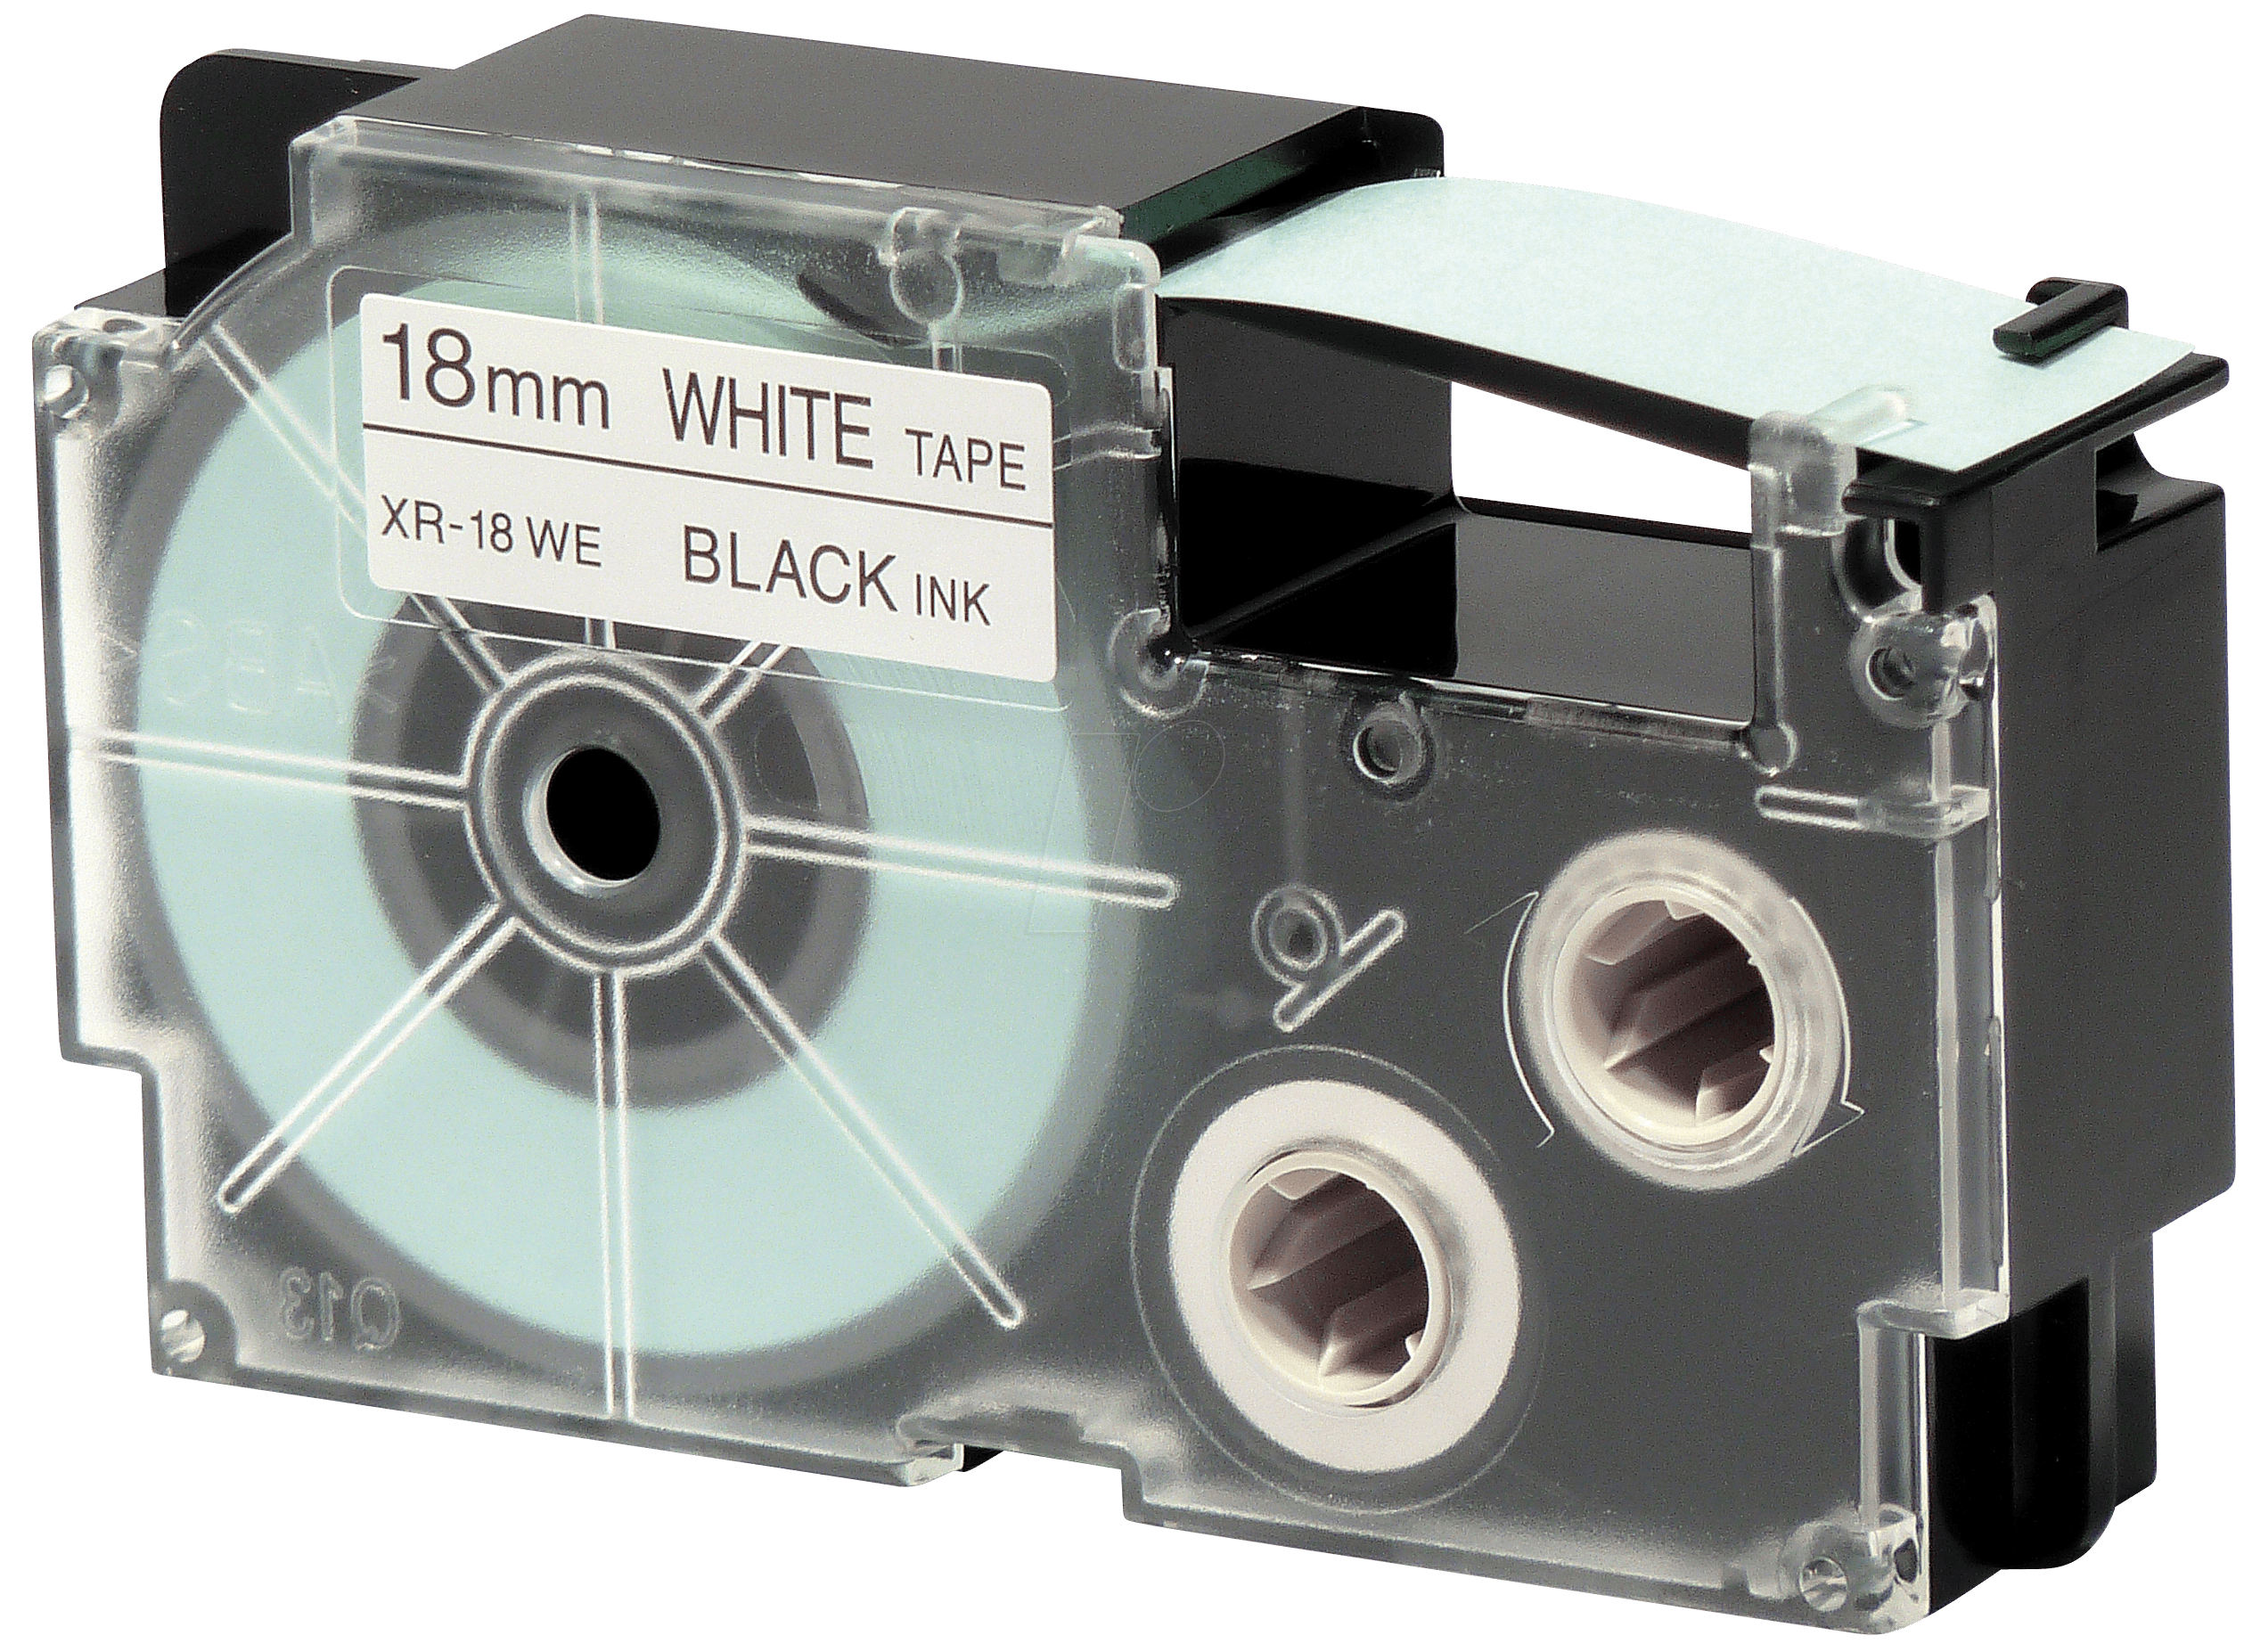 https://cdn-reichelt.de/bilder/web/xxl_ws/F100/CAS_XR-18WE1WHITE_BLACK.png